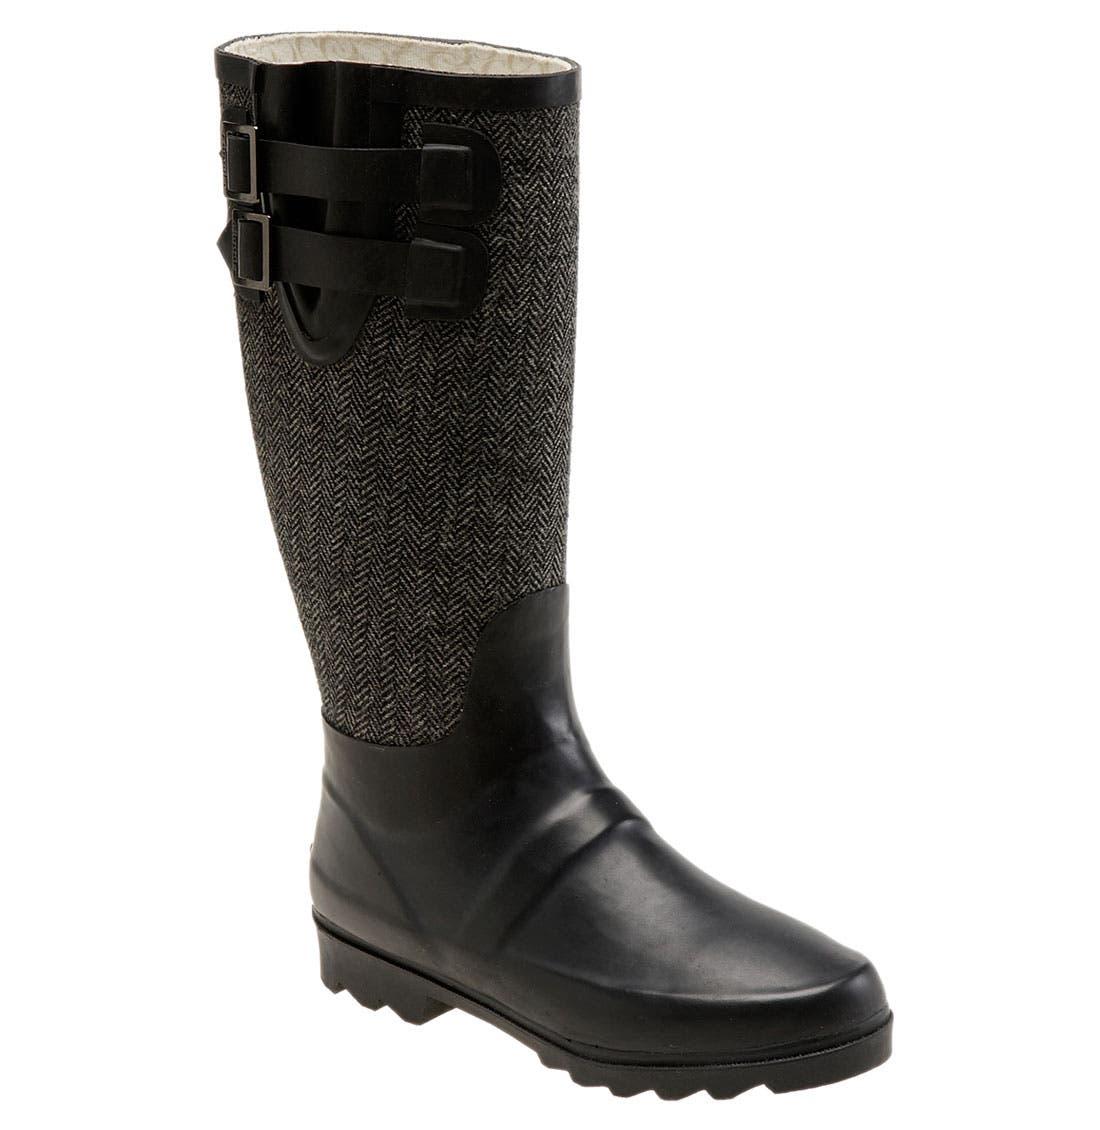 Alternate Image 1 Selected - Chooka Signature Herringbone Rain Boot (Women)